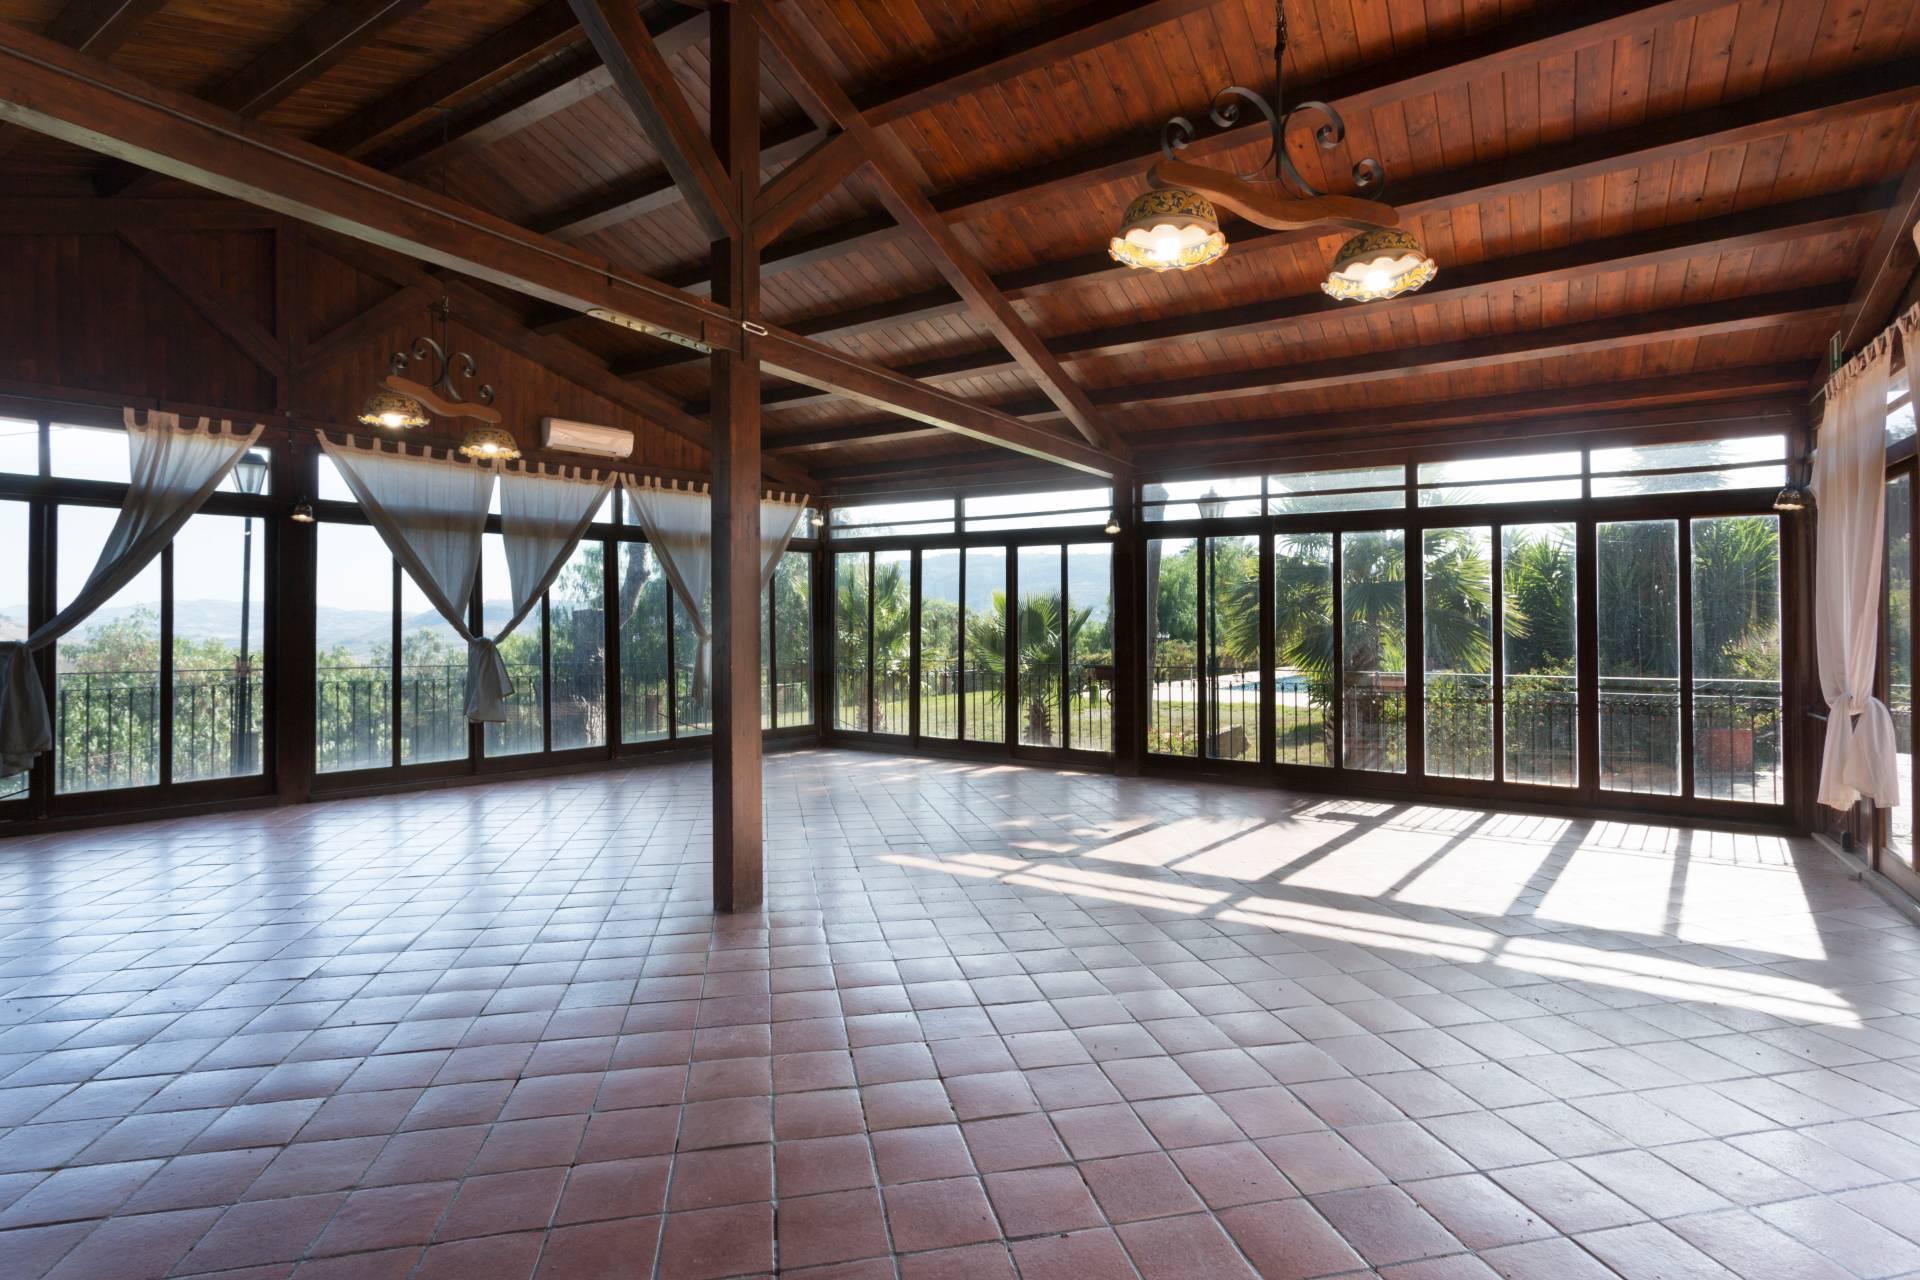 Villa in Vendita a Piazza Armerina: 5 locali, 550 mq - Foto 13